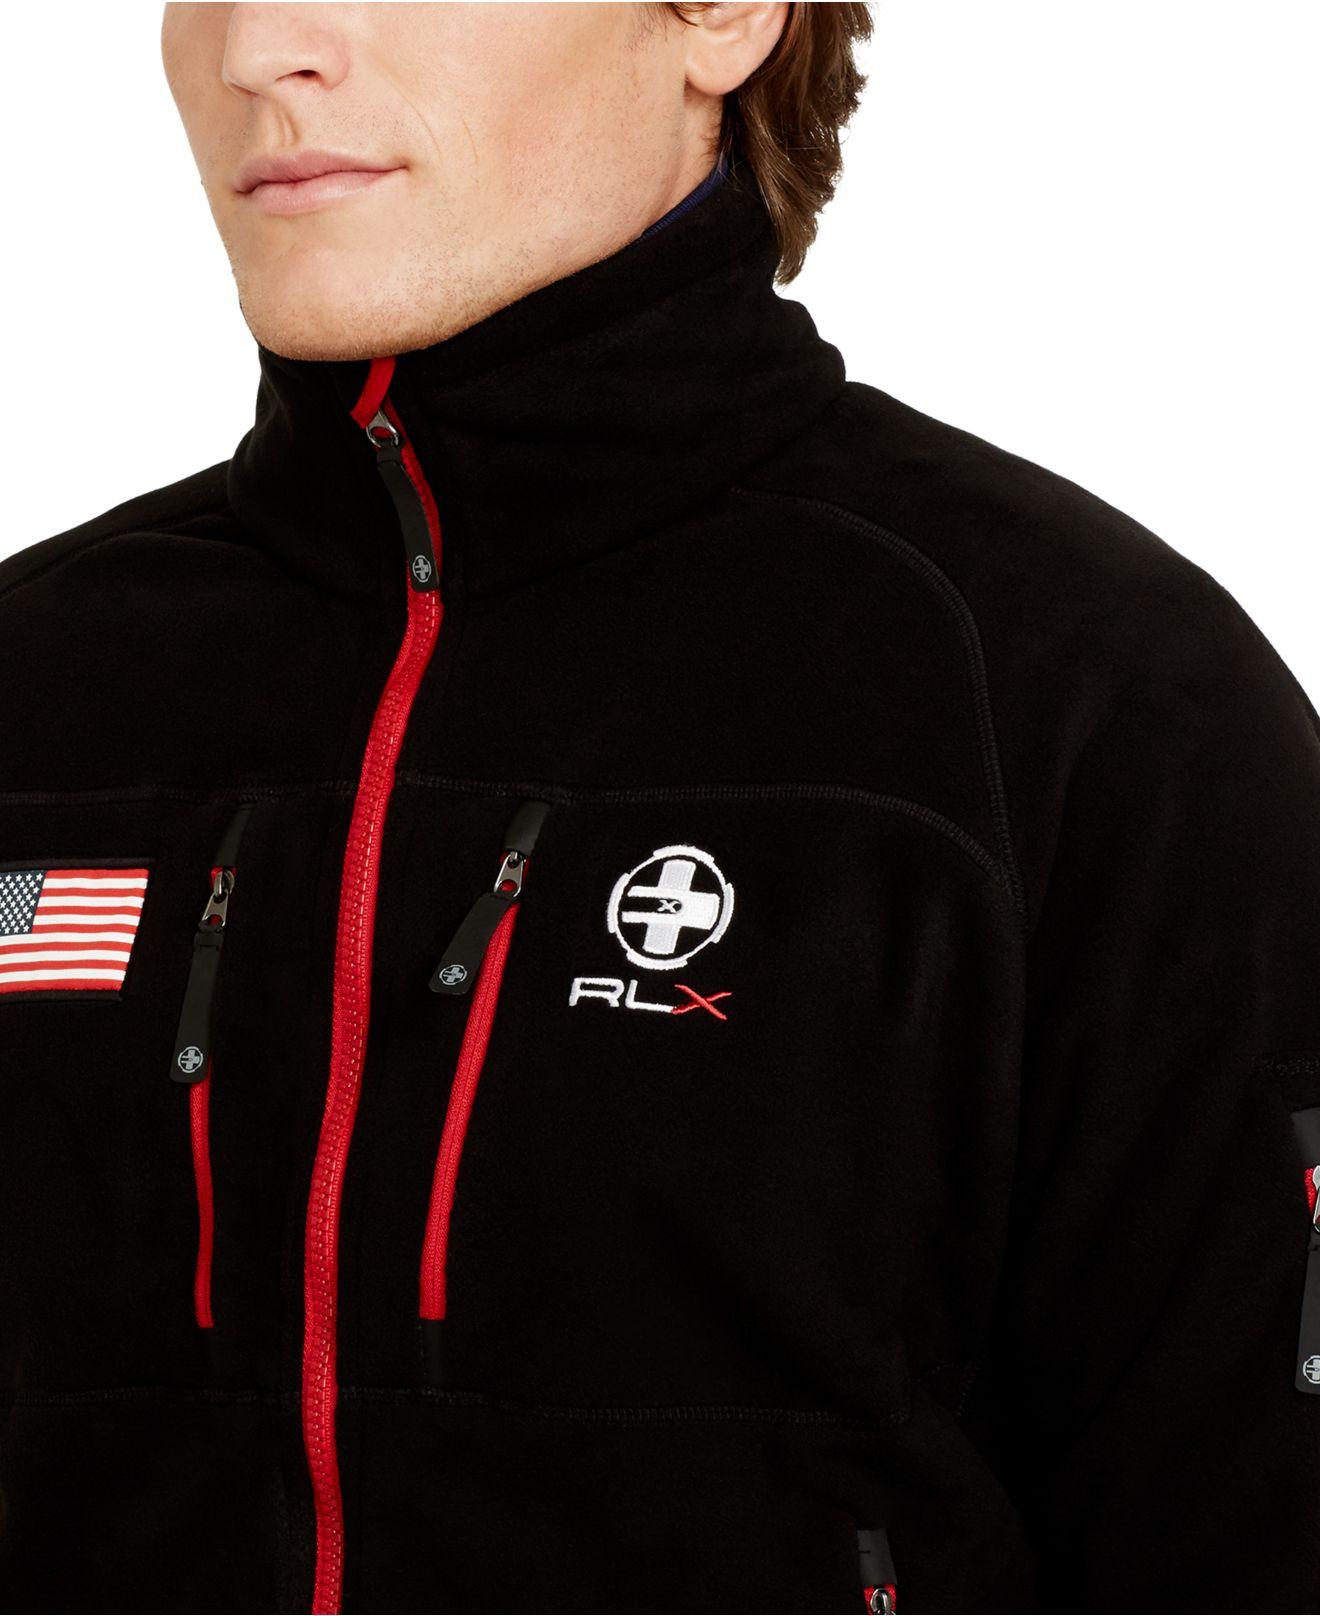 Polo ralph lauren Rlx Snow Polo Fleece Jacket in Black for Men | Lyst